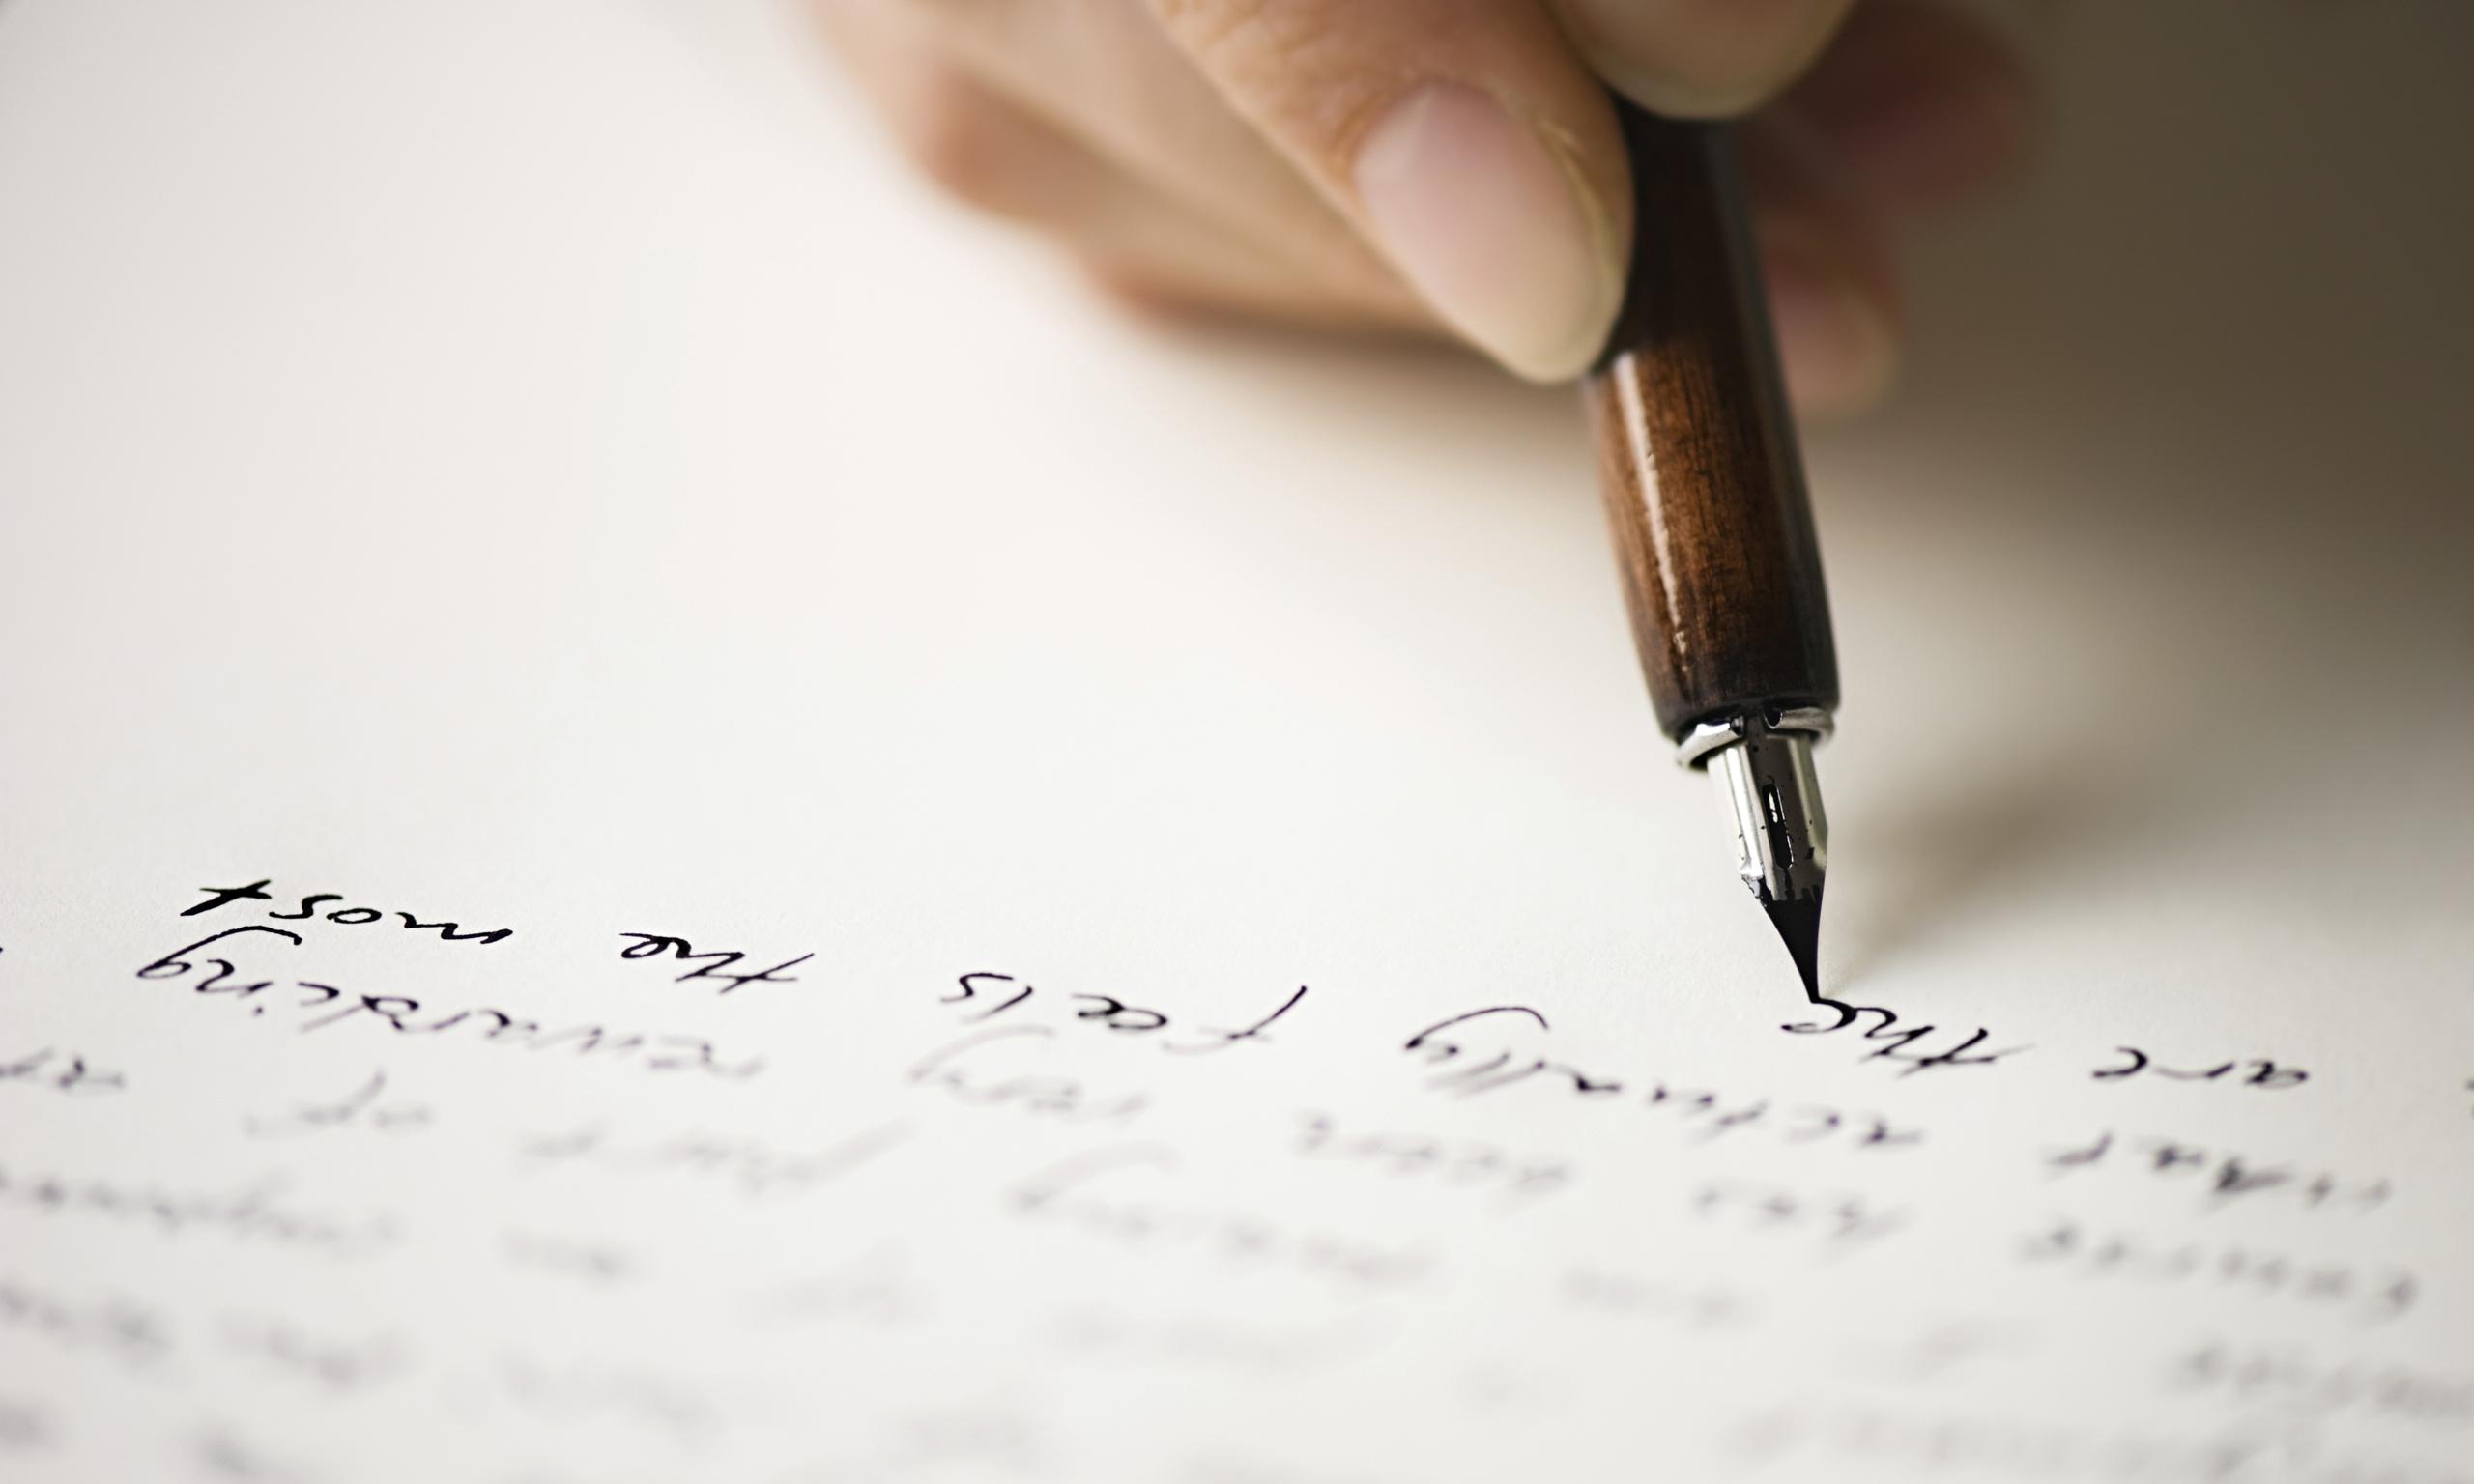 John keats poetry essay